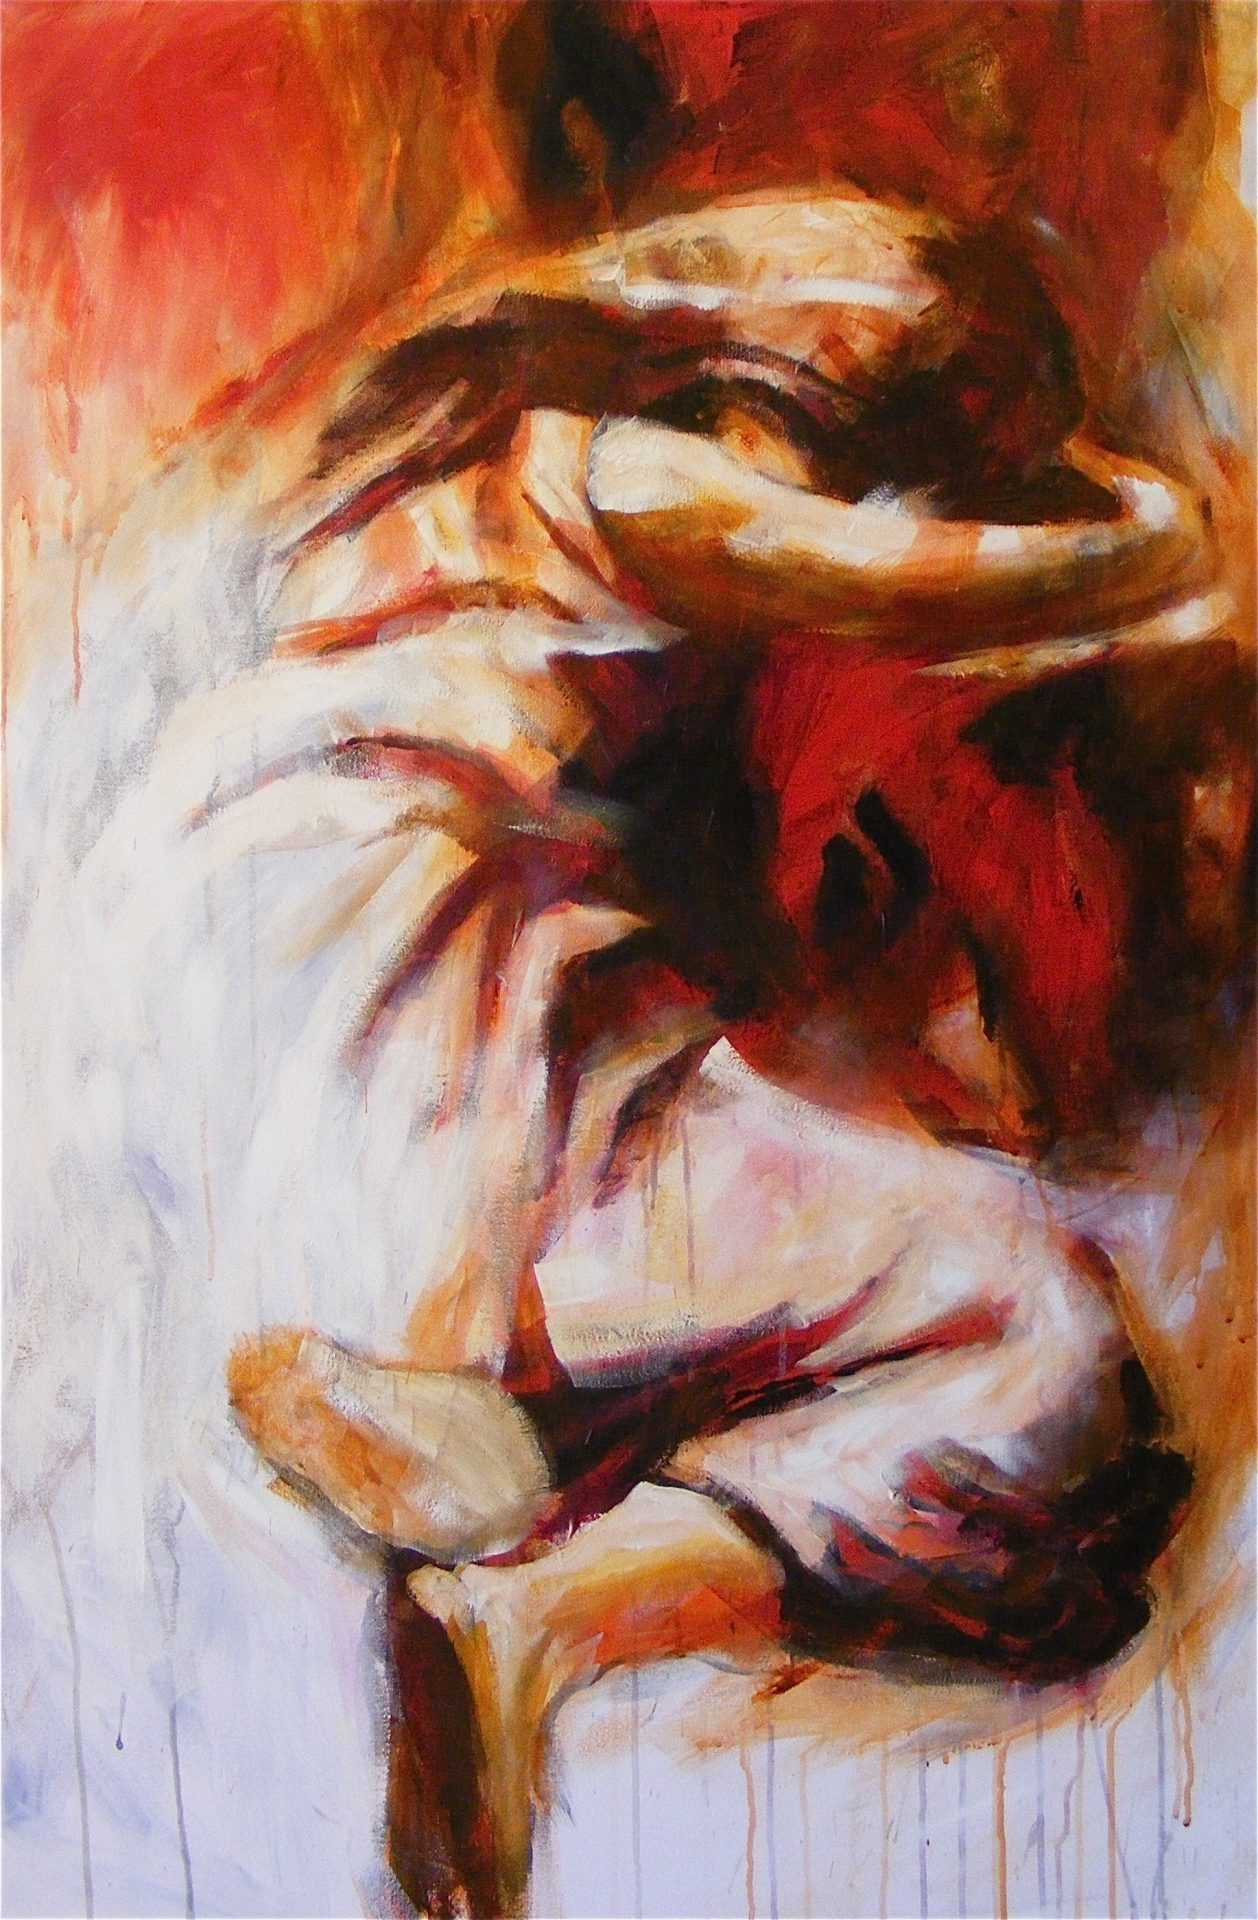 Acrylics on canvas 120cm by 80cm